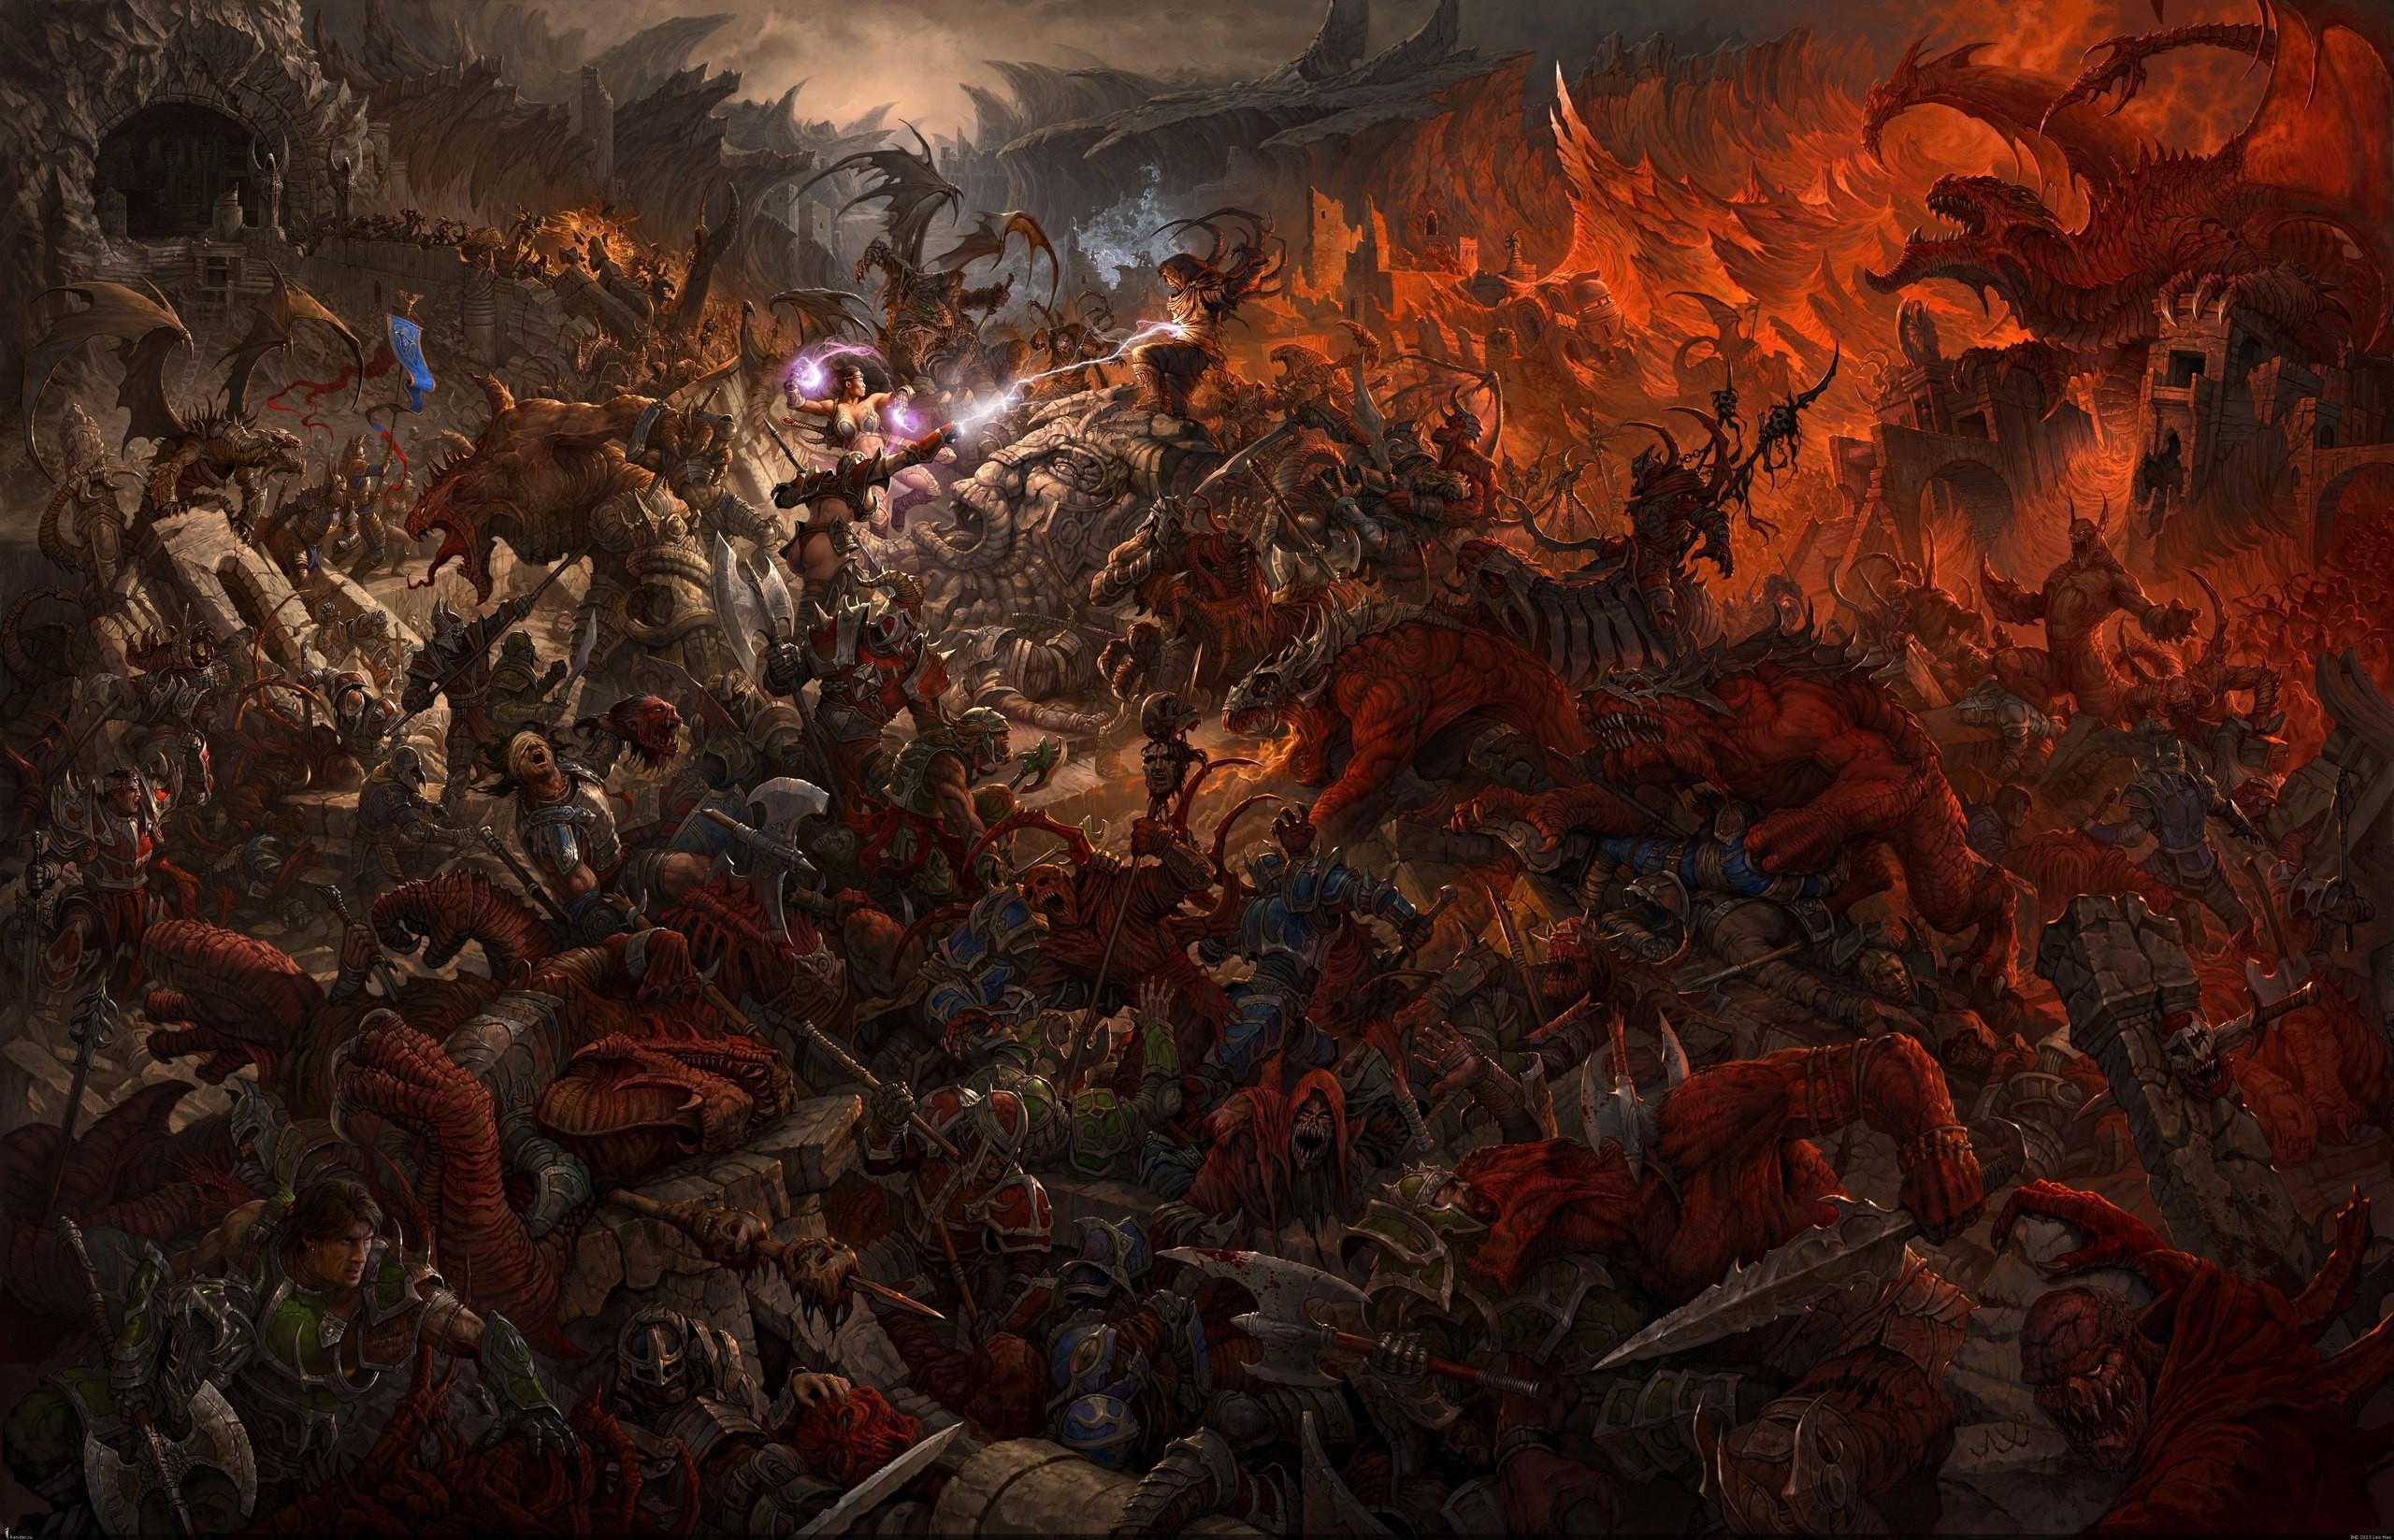 Epic battle wallpaper hd